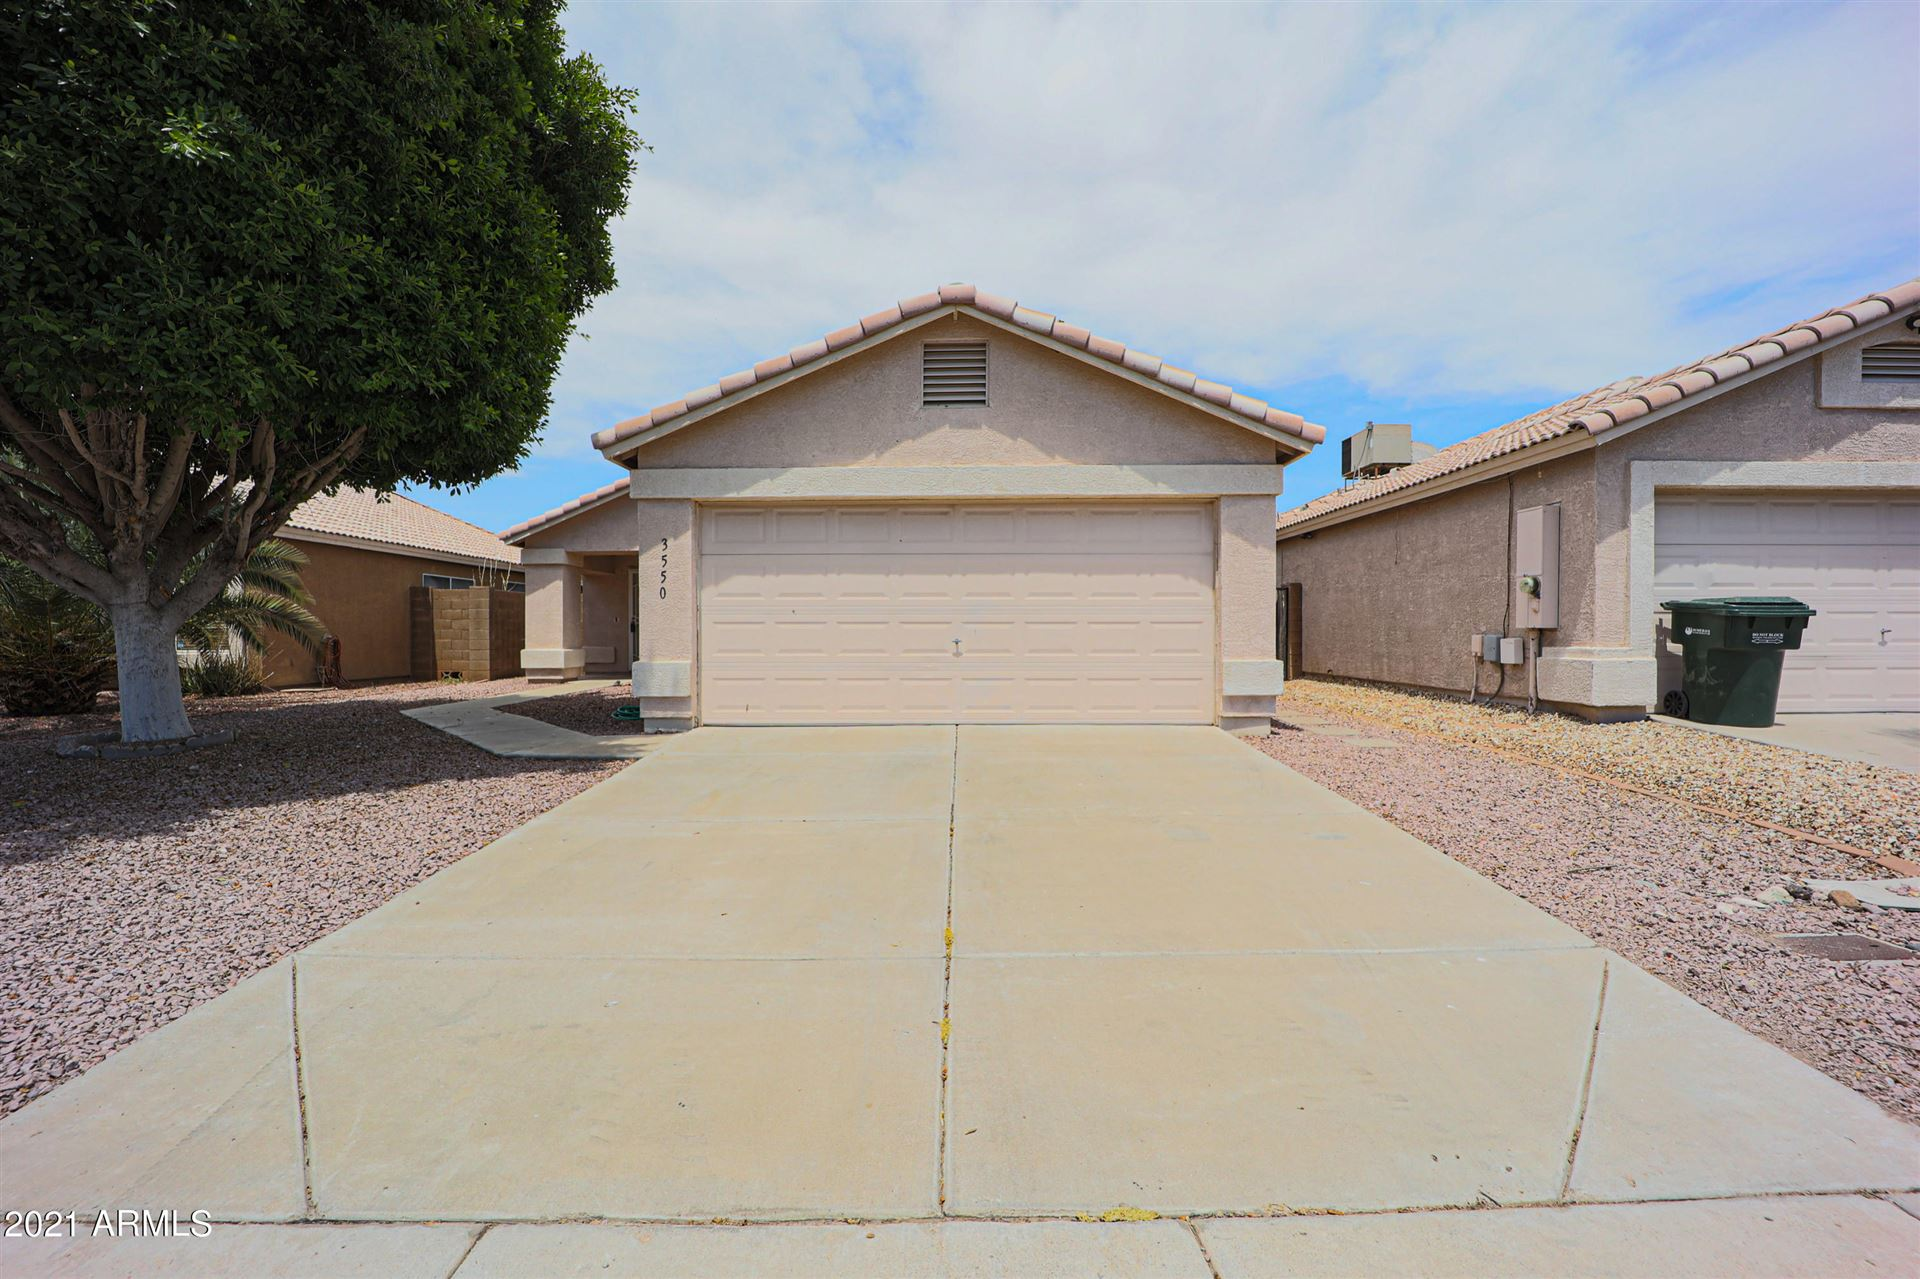 Photo of 3550 W Via Del Sol Drive, Glendale, AZ 85310 (MLS # 6232537)